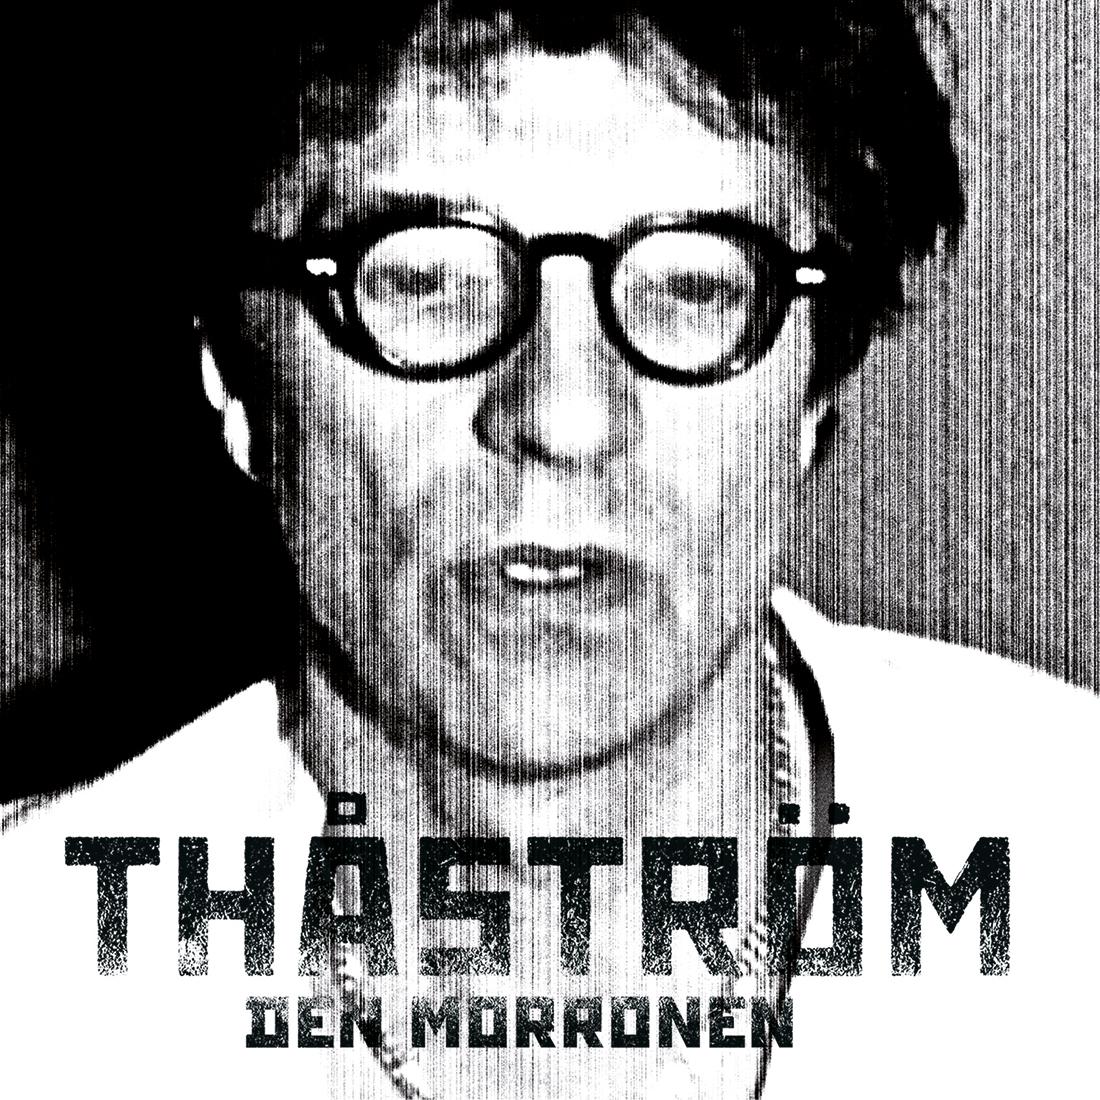 THA_MORRONEN_FRONT-21